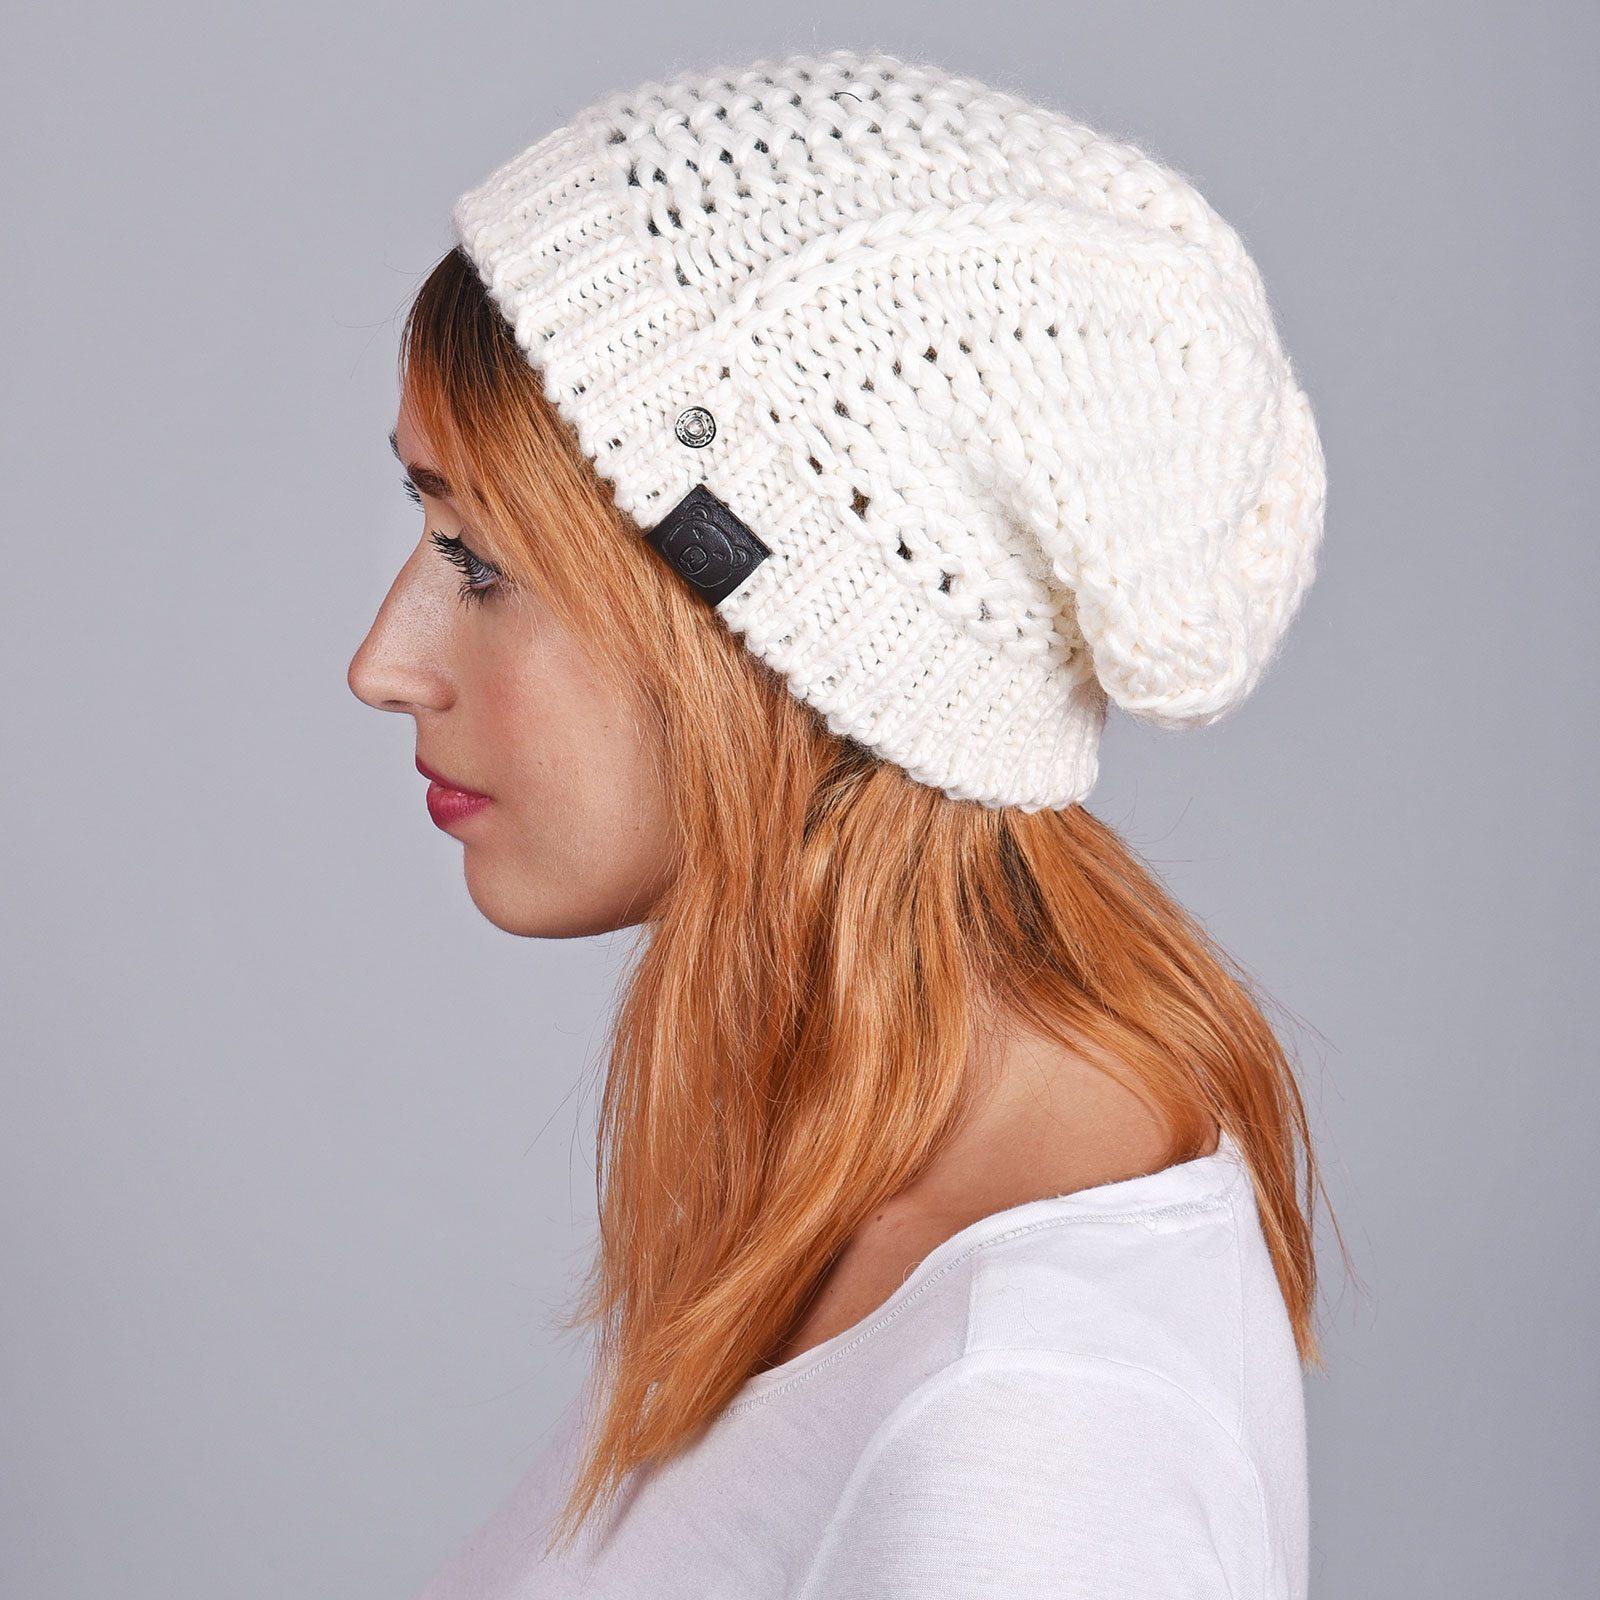 http://lookbook.allee-du-foulard.fr/wp-content/uploads/2018/12/CP-01071-VF16-1-bonnet-femme-hiver-blanc-1600x1600.jpg